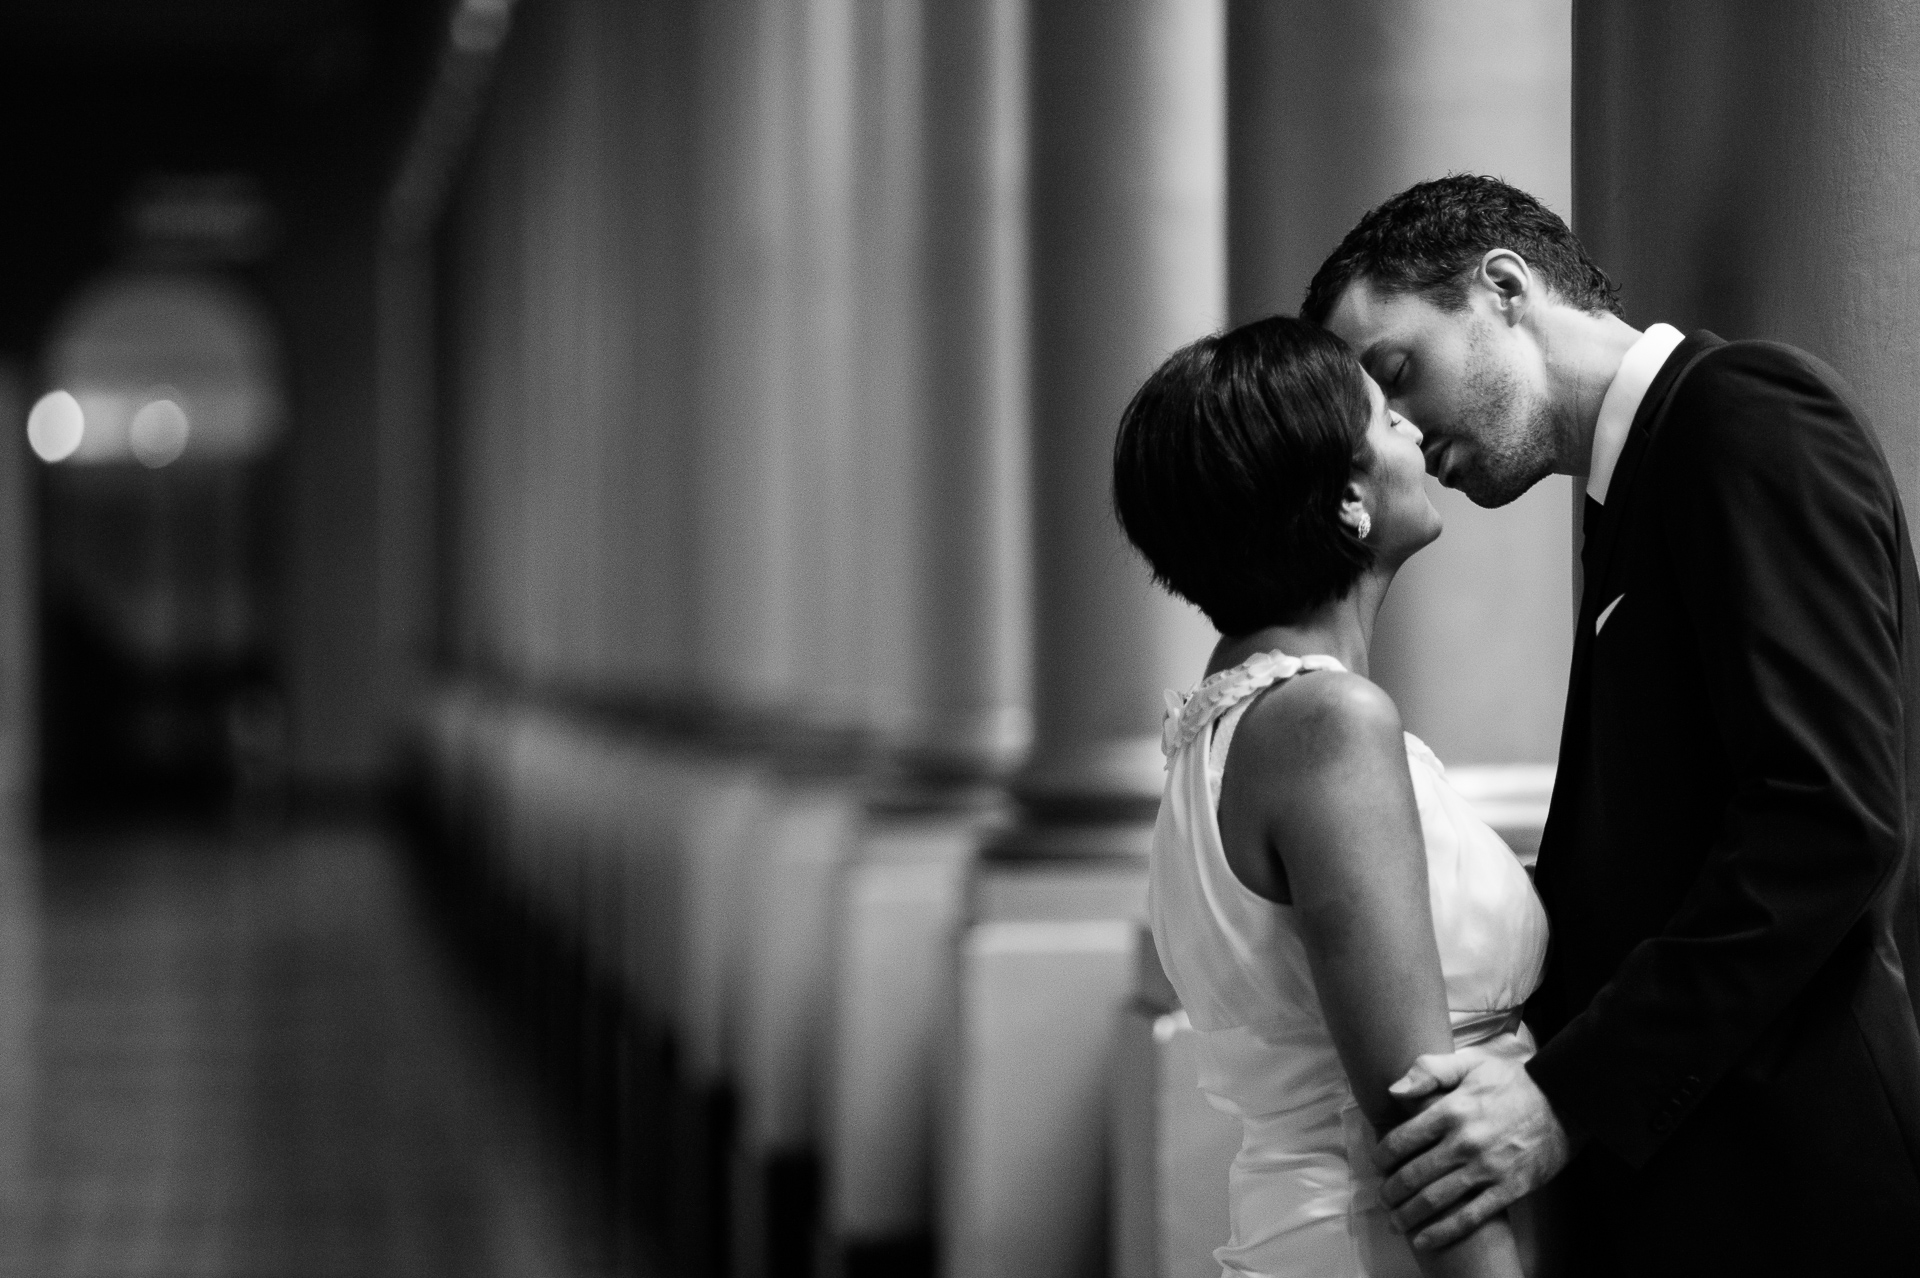 National Building Museum, fotógrafo de bodas de Washington, DC | Llegaron temprano al juzgado